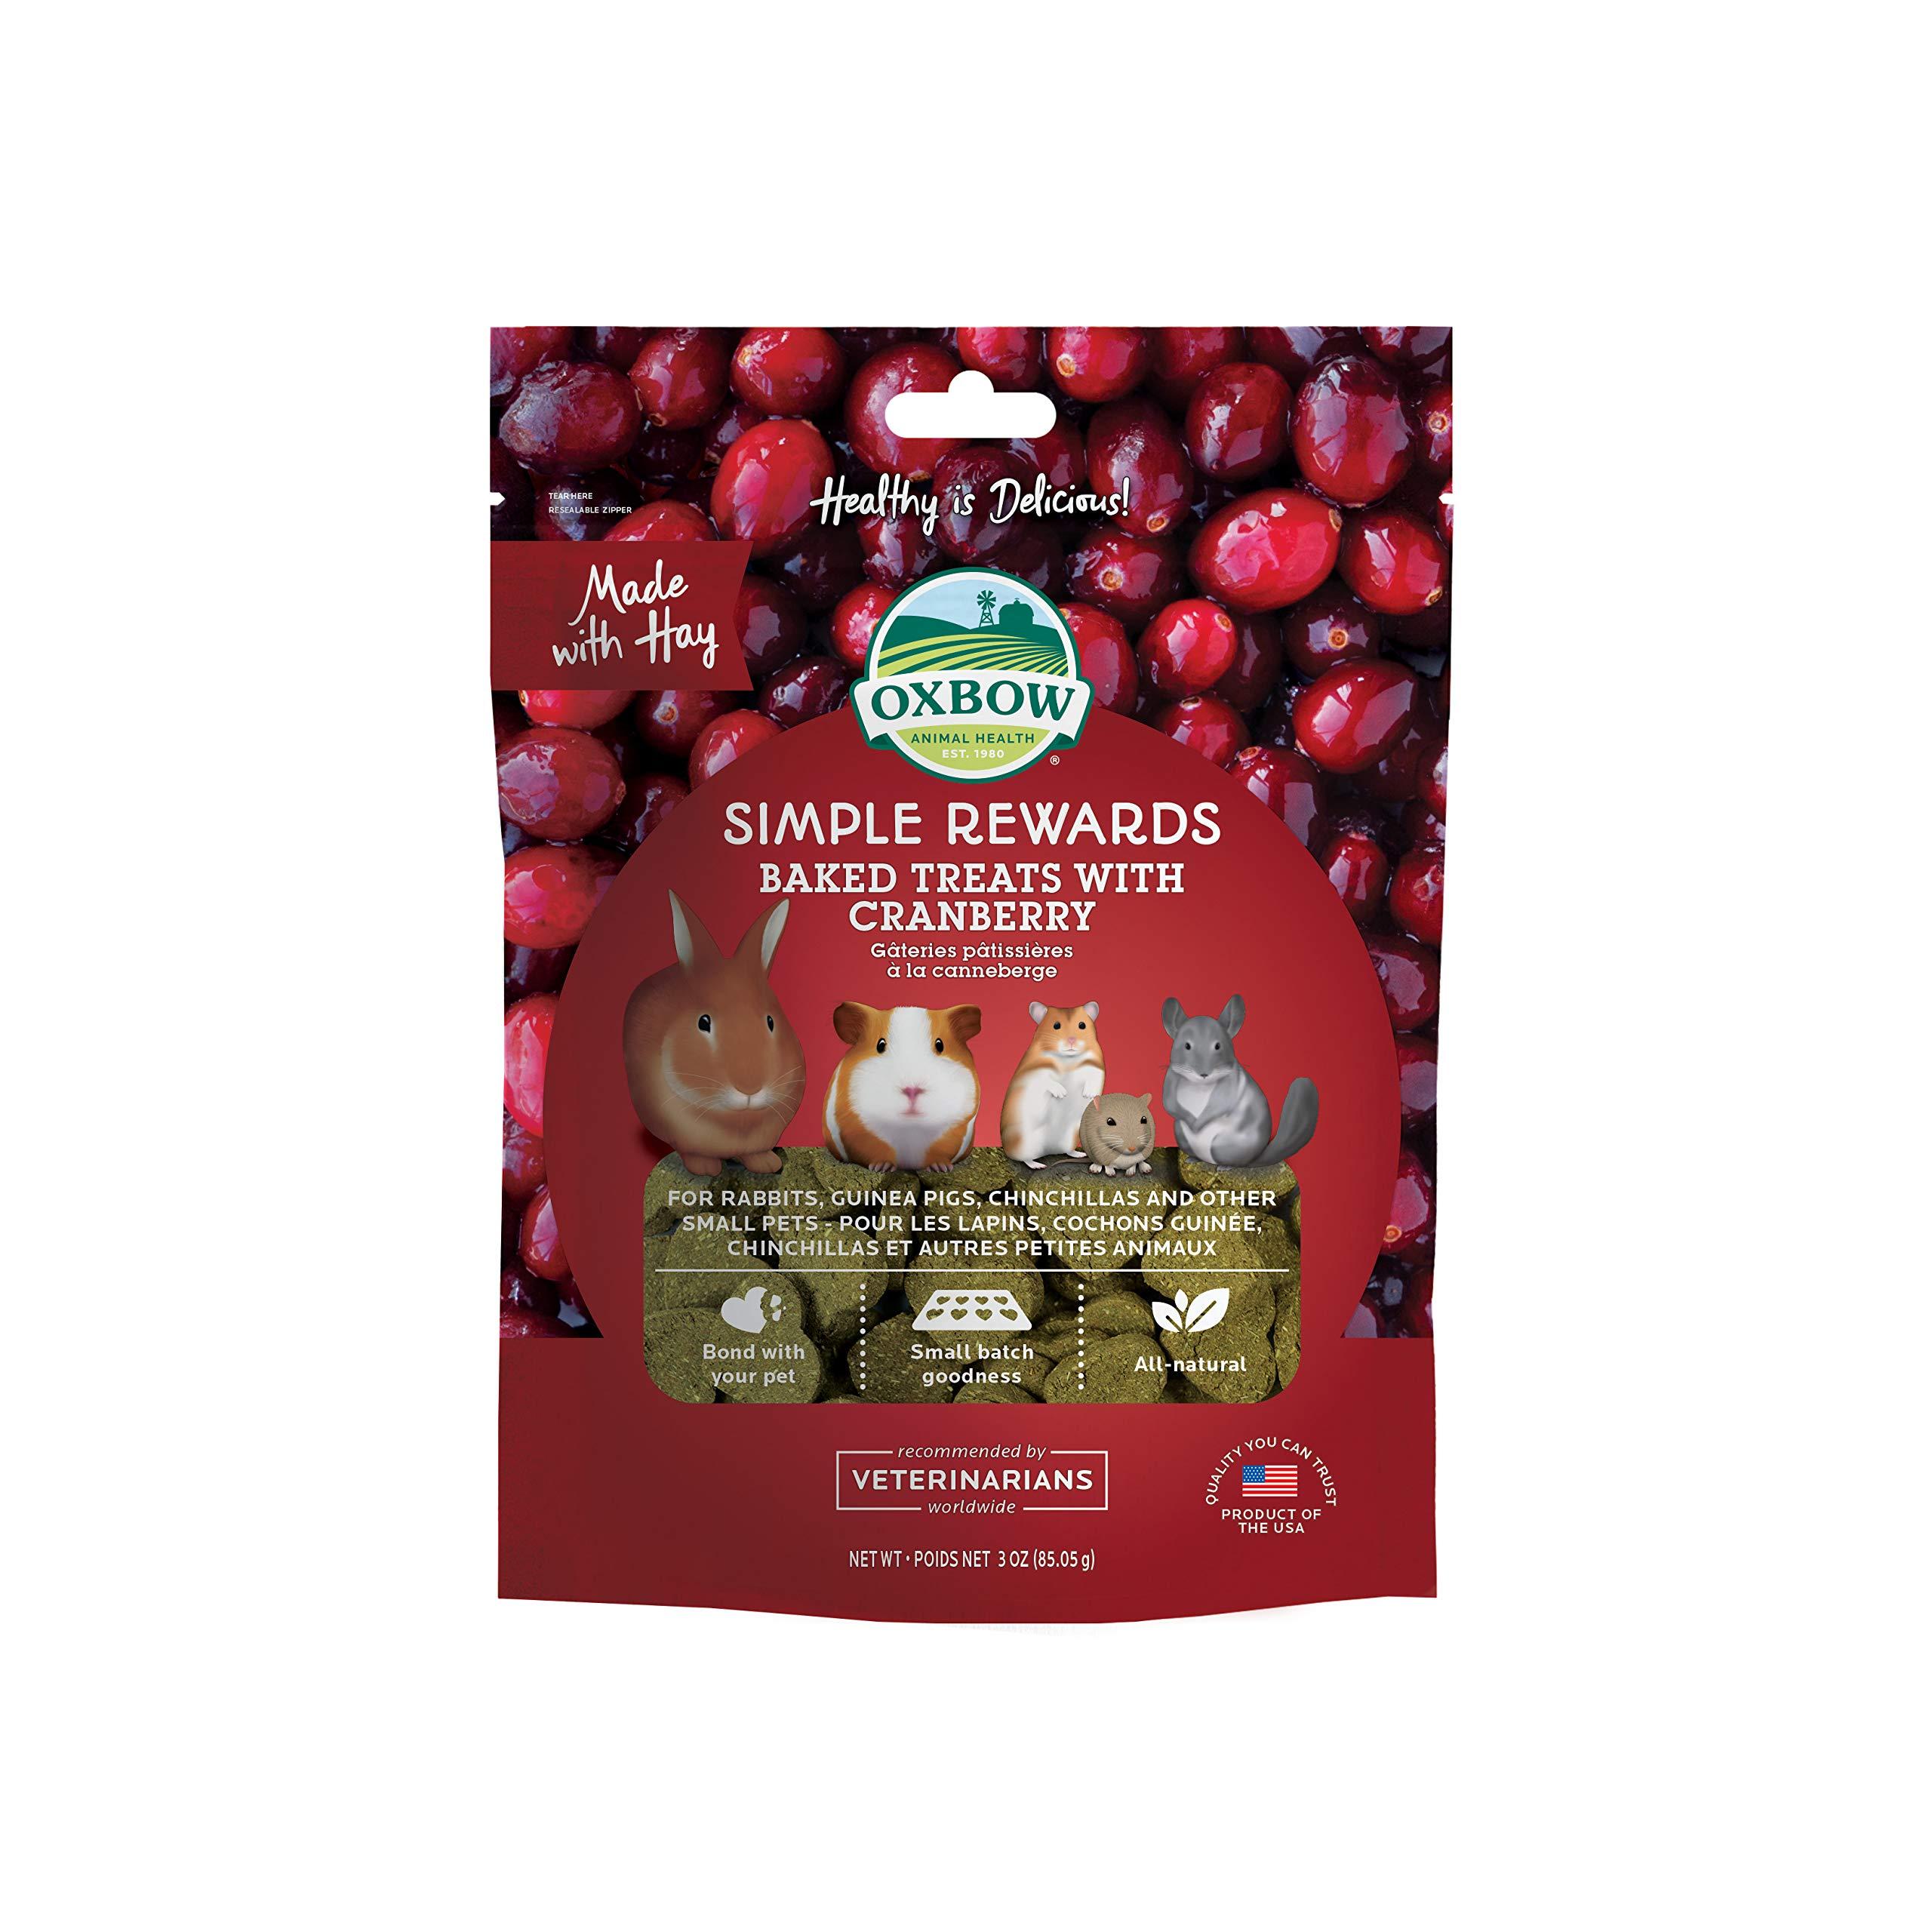 Oxbow Cranberry Simple Rewards Baked Treats